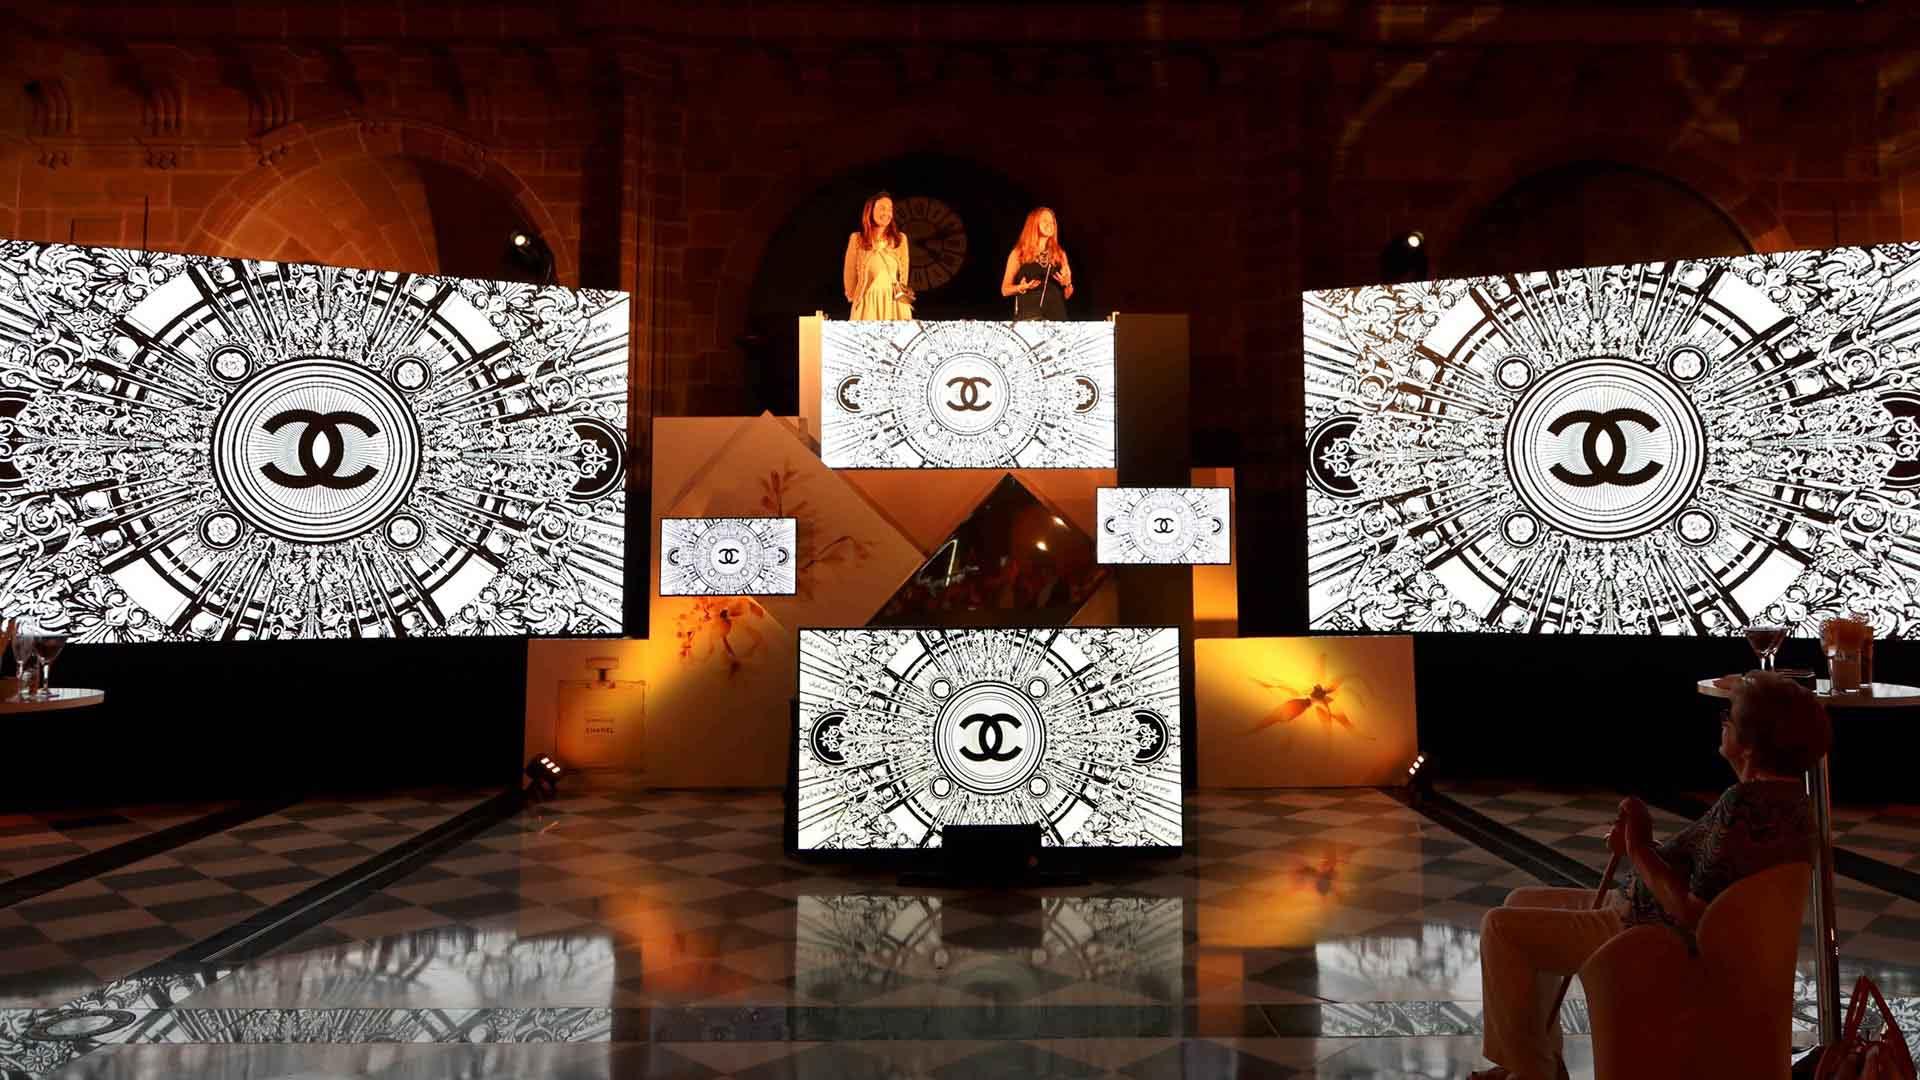 Evento presentación perfume chanel diseño escenario